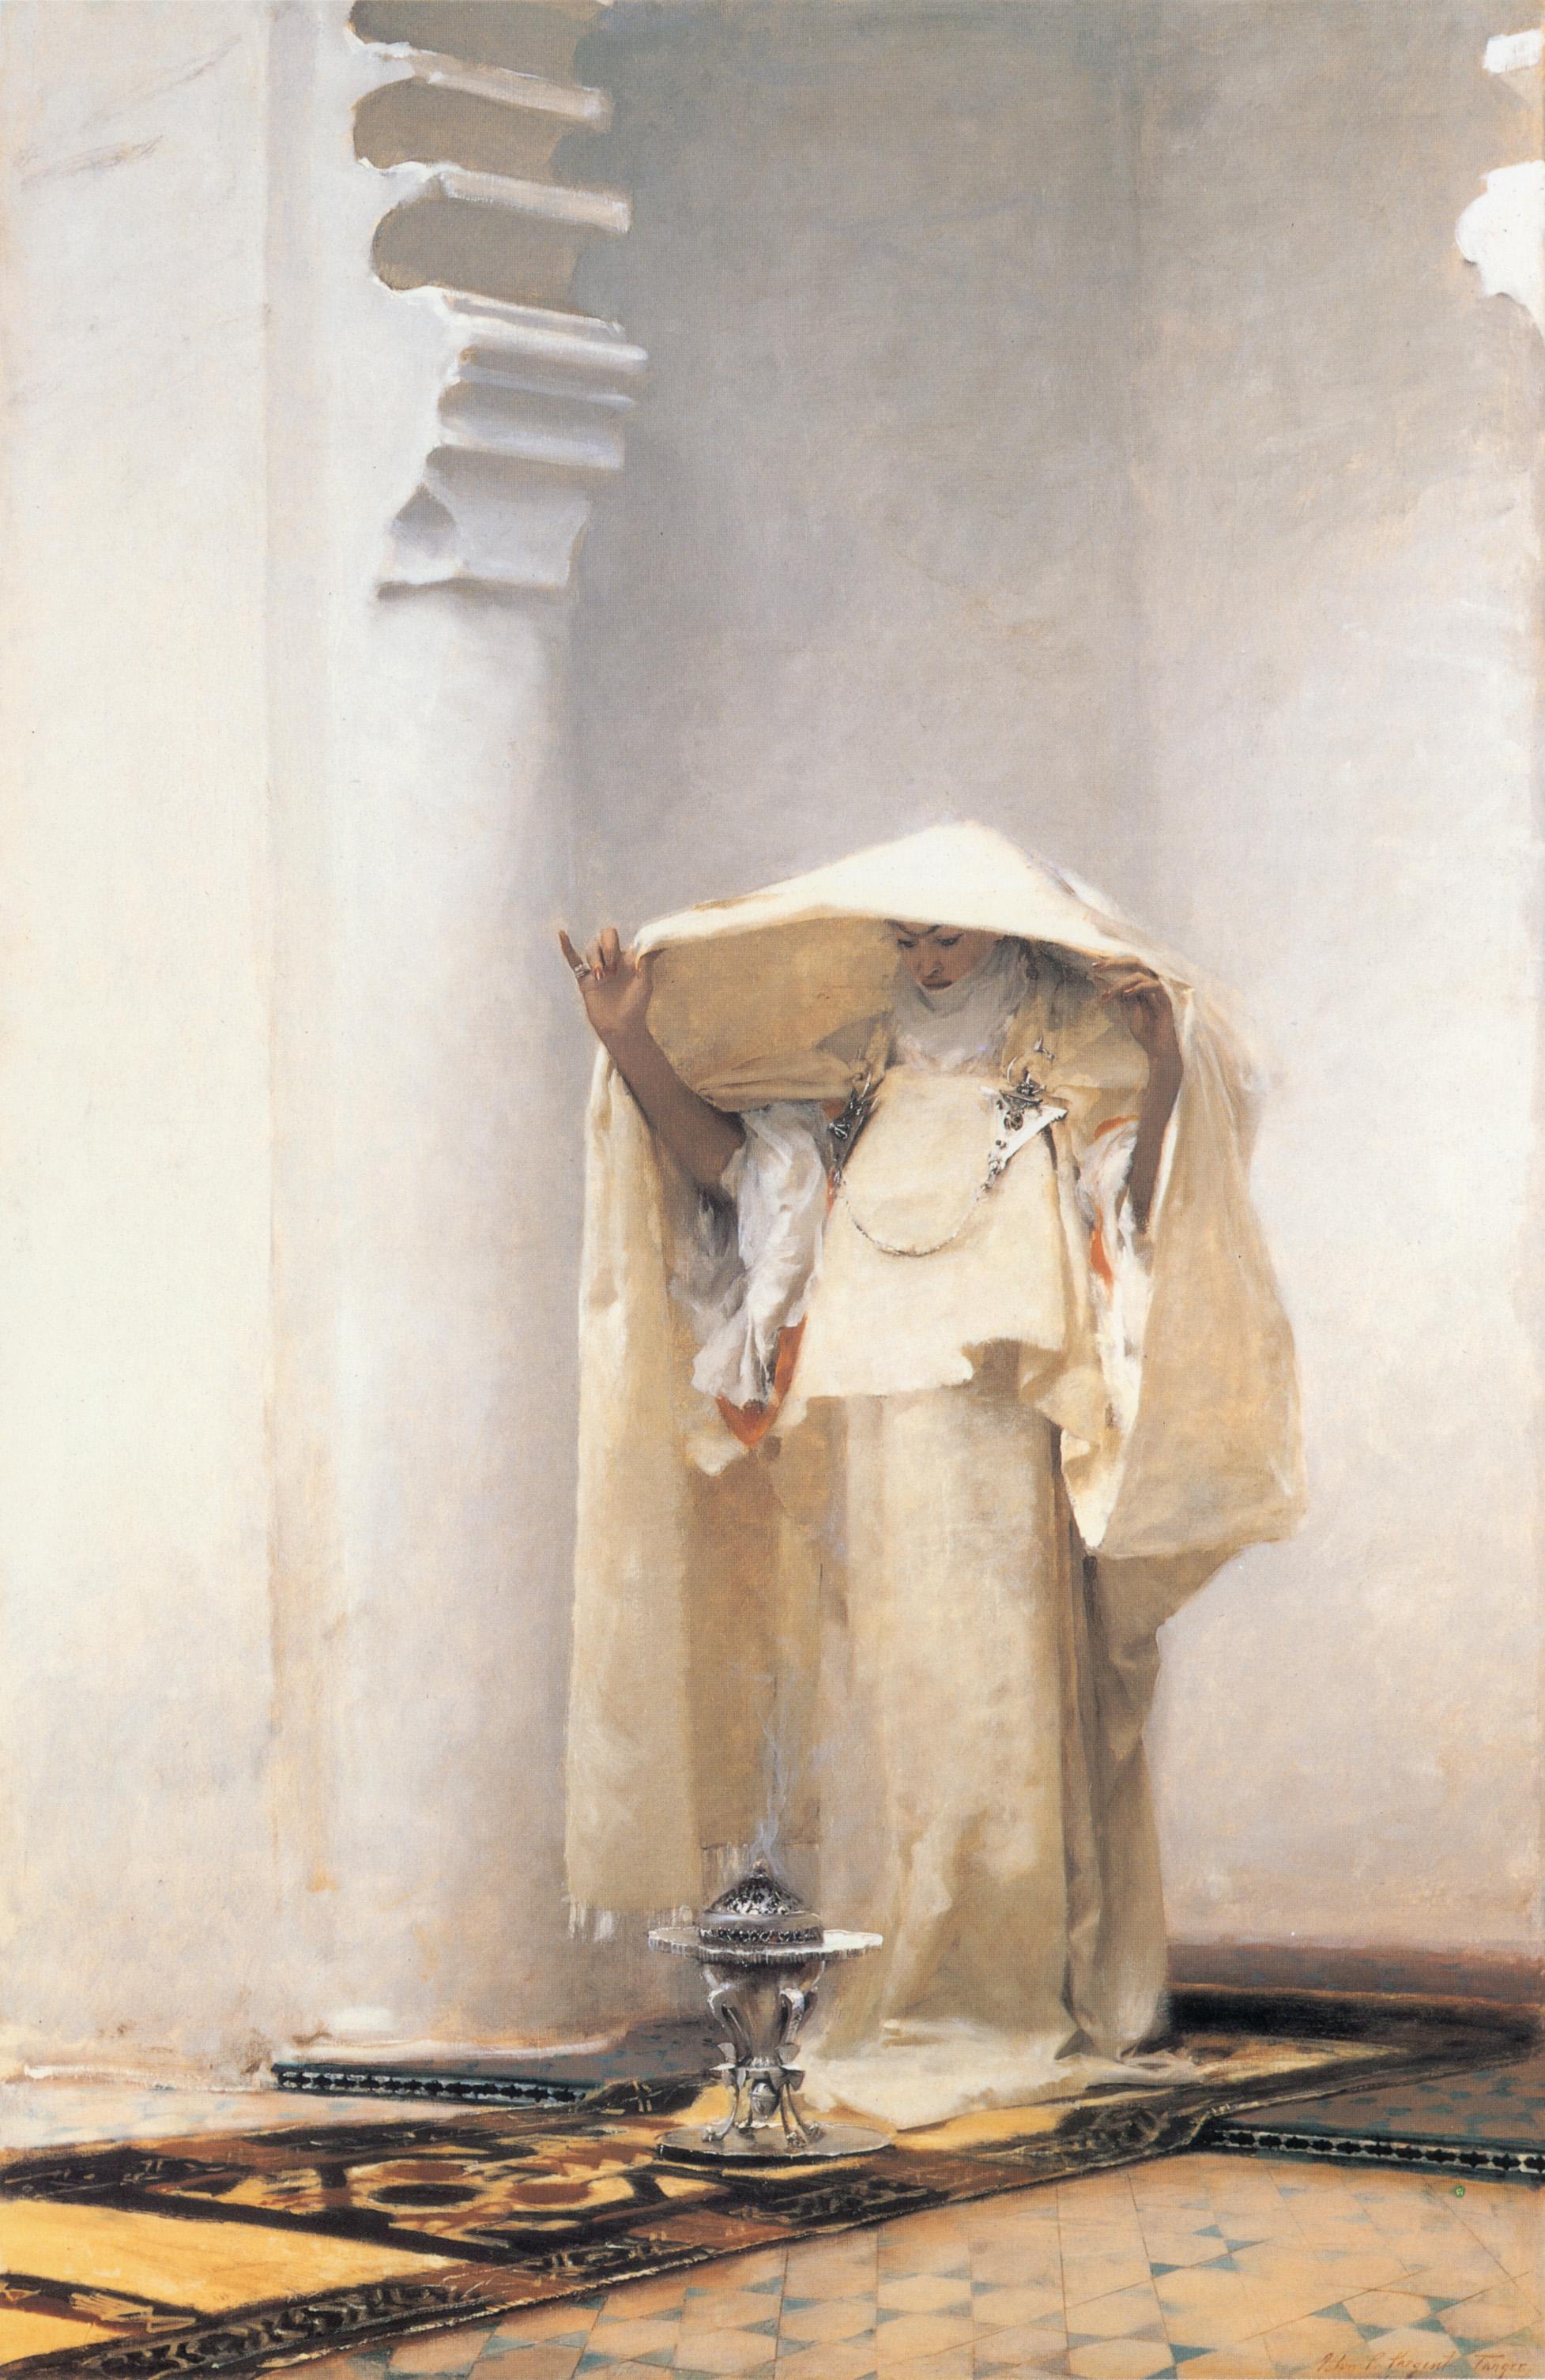 Fumee d'ambre gris (1880)